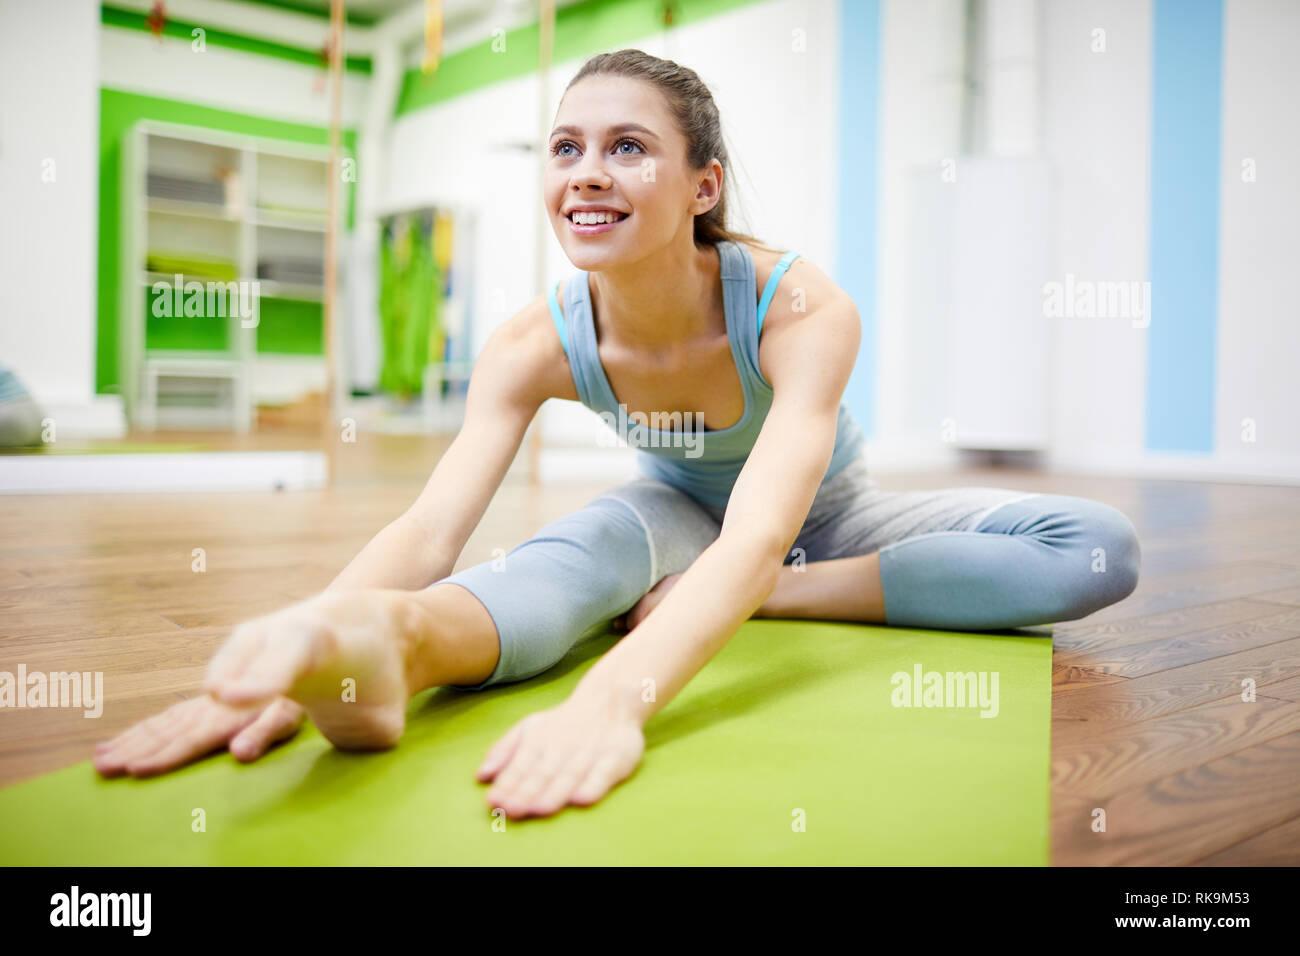 Junge Frau Dehnen in Fitness Club Stockfoto